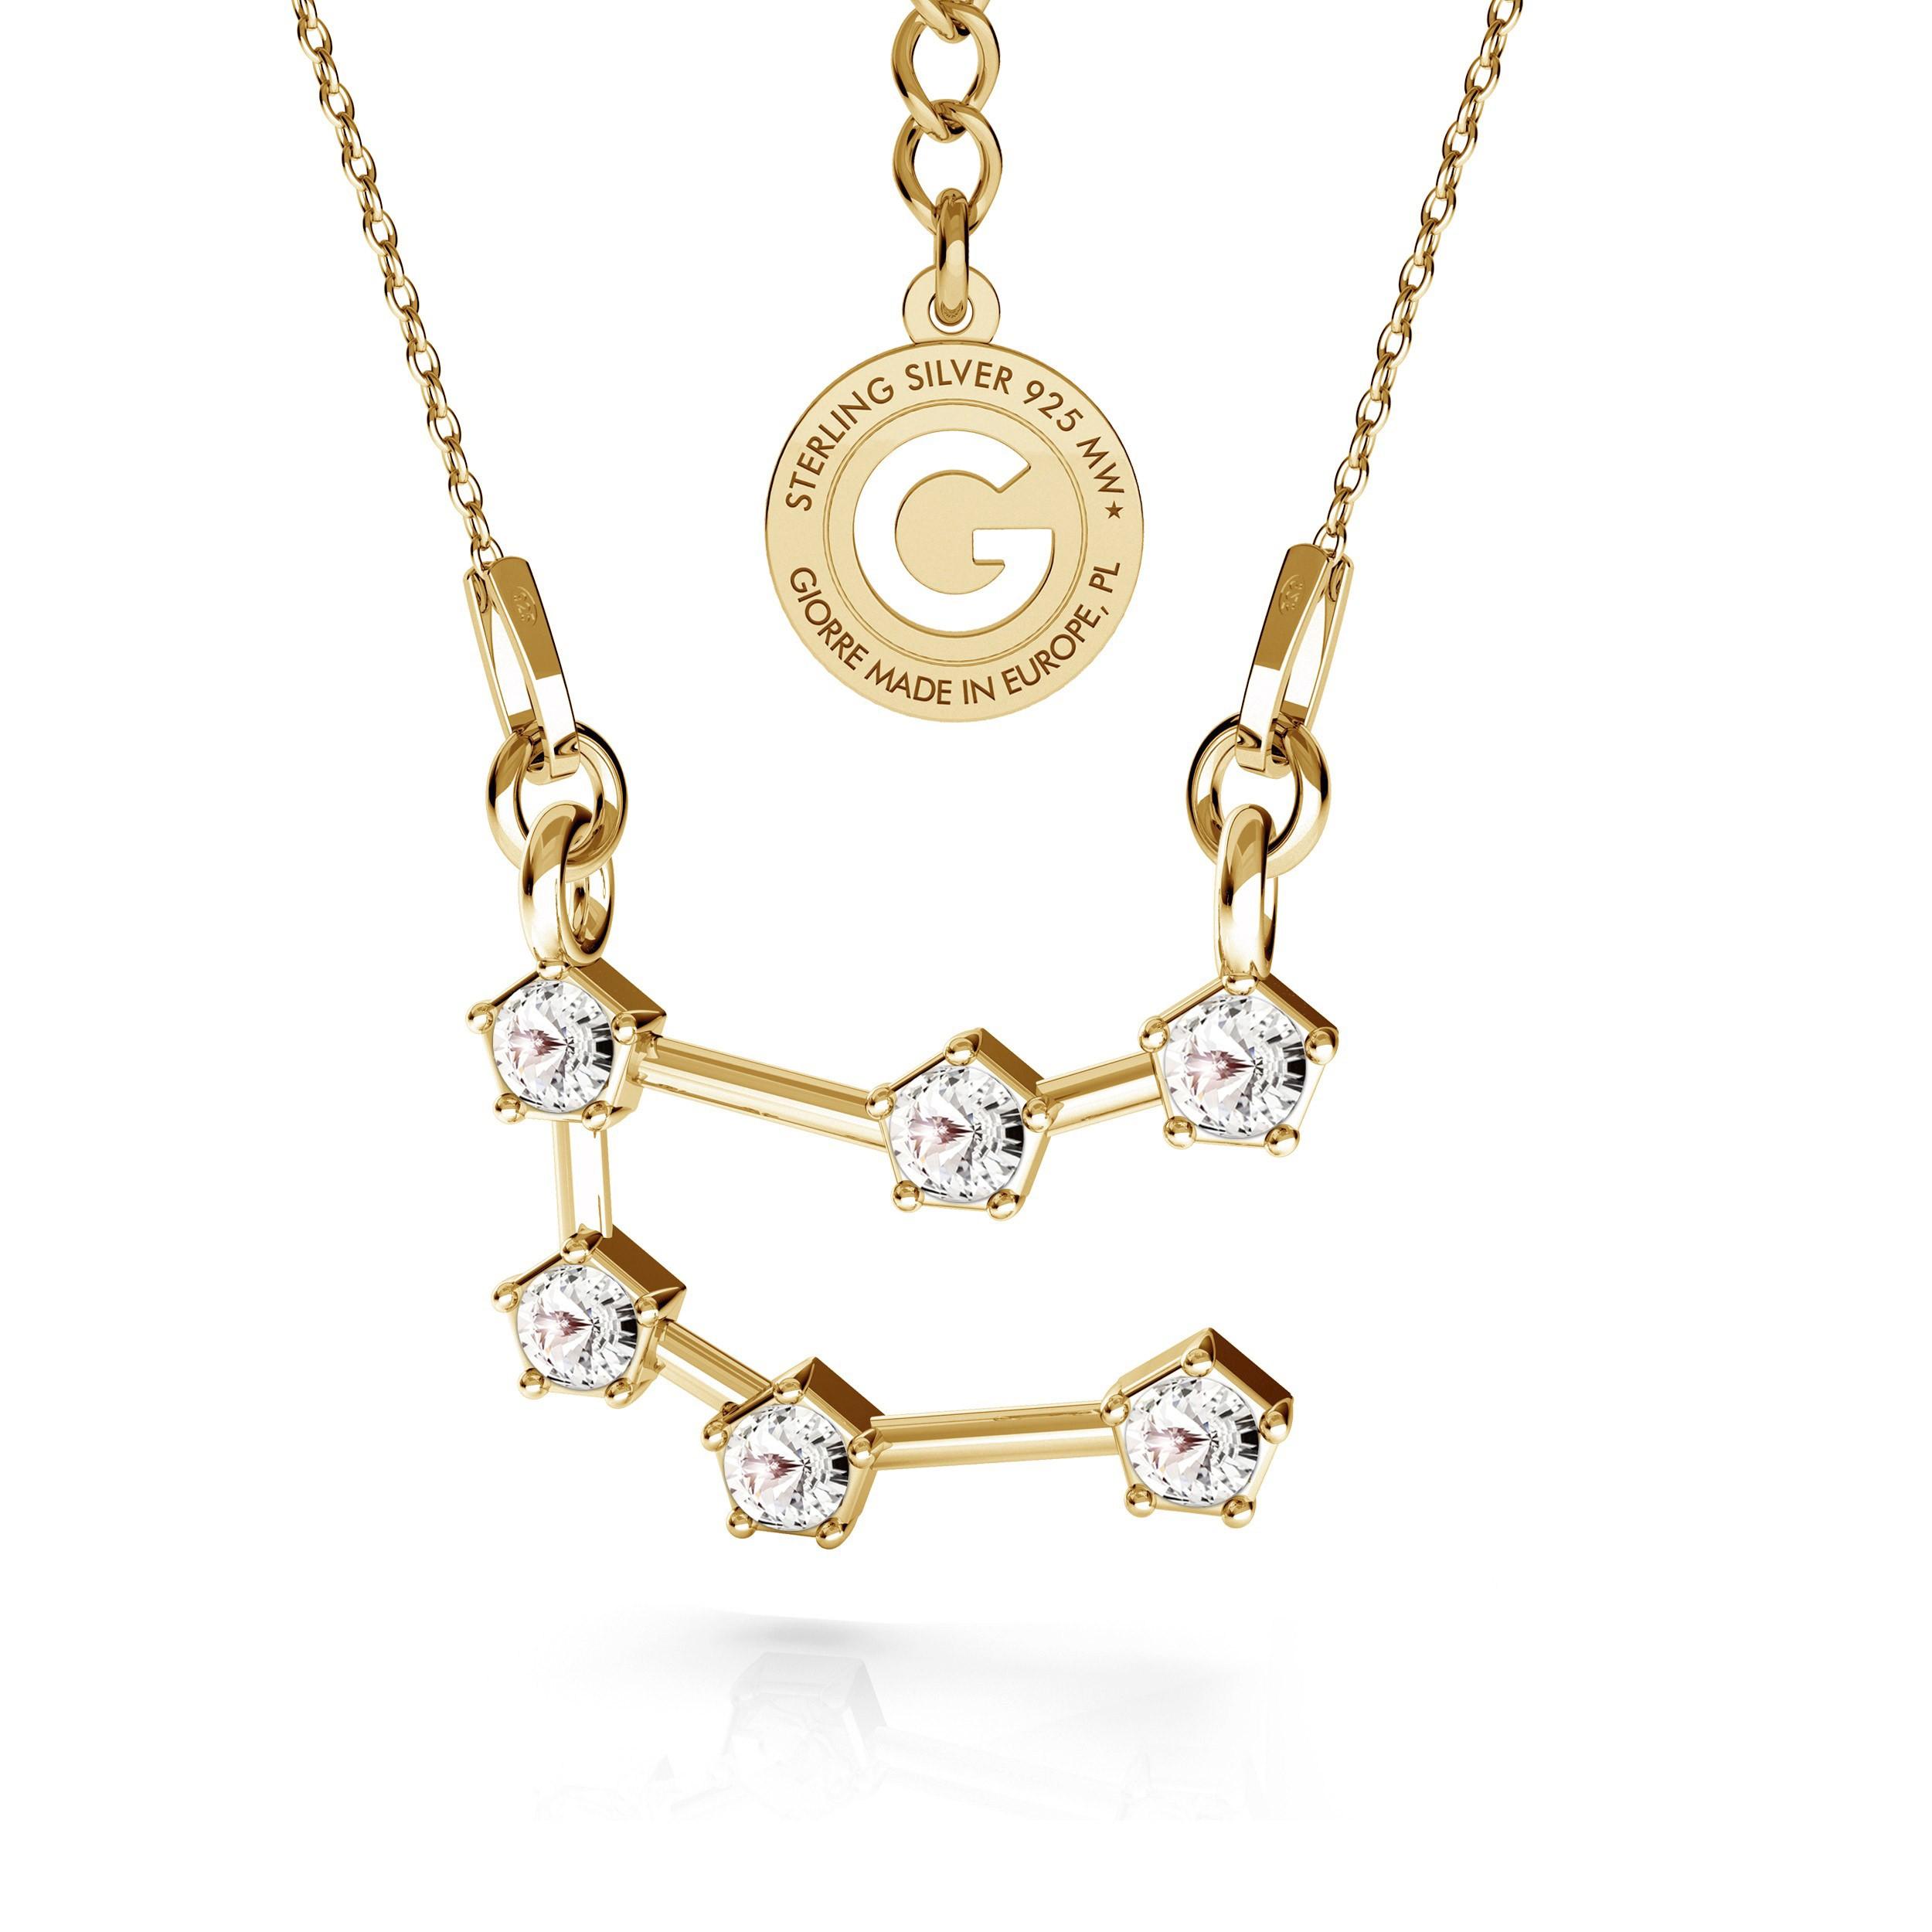 GEMINI zodiac sign necklace with Swarovski Crystals silver 925